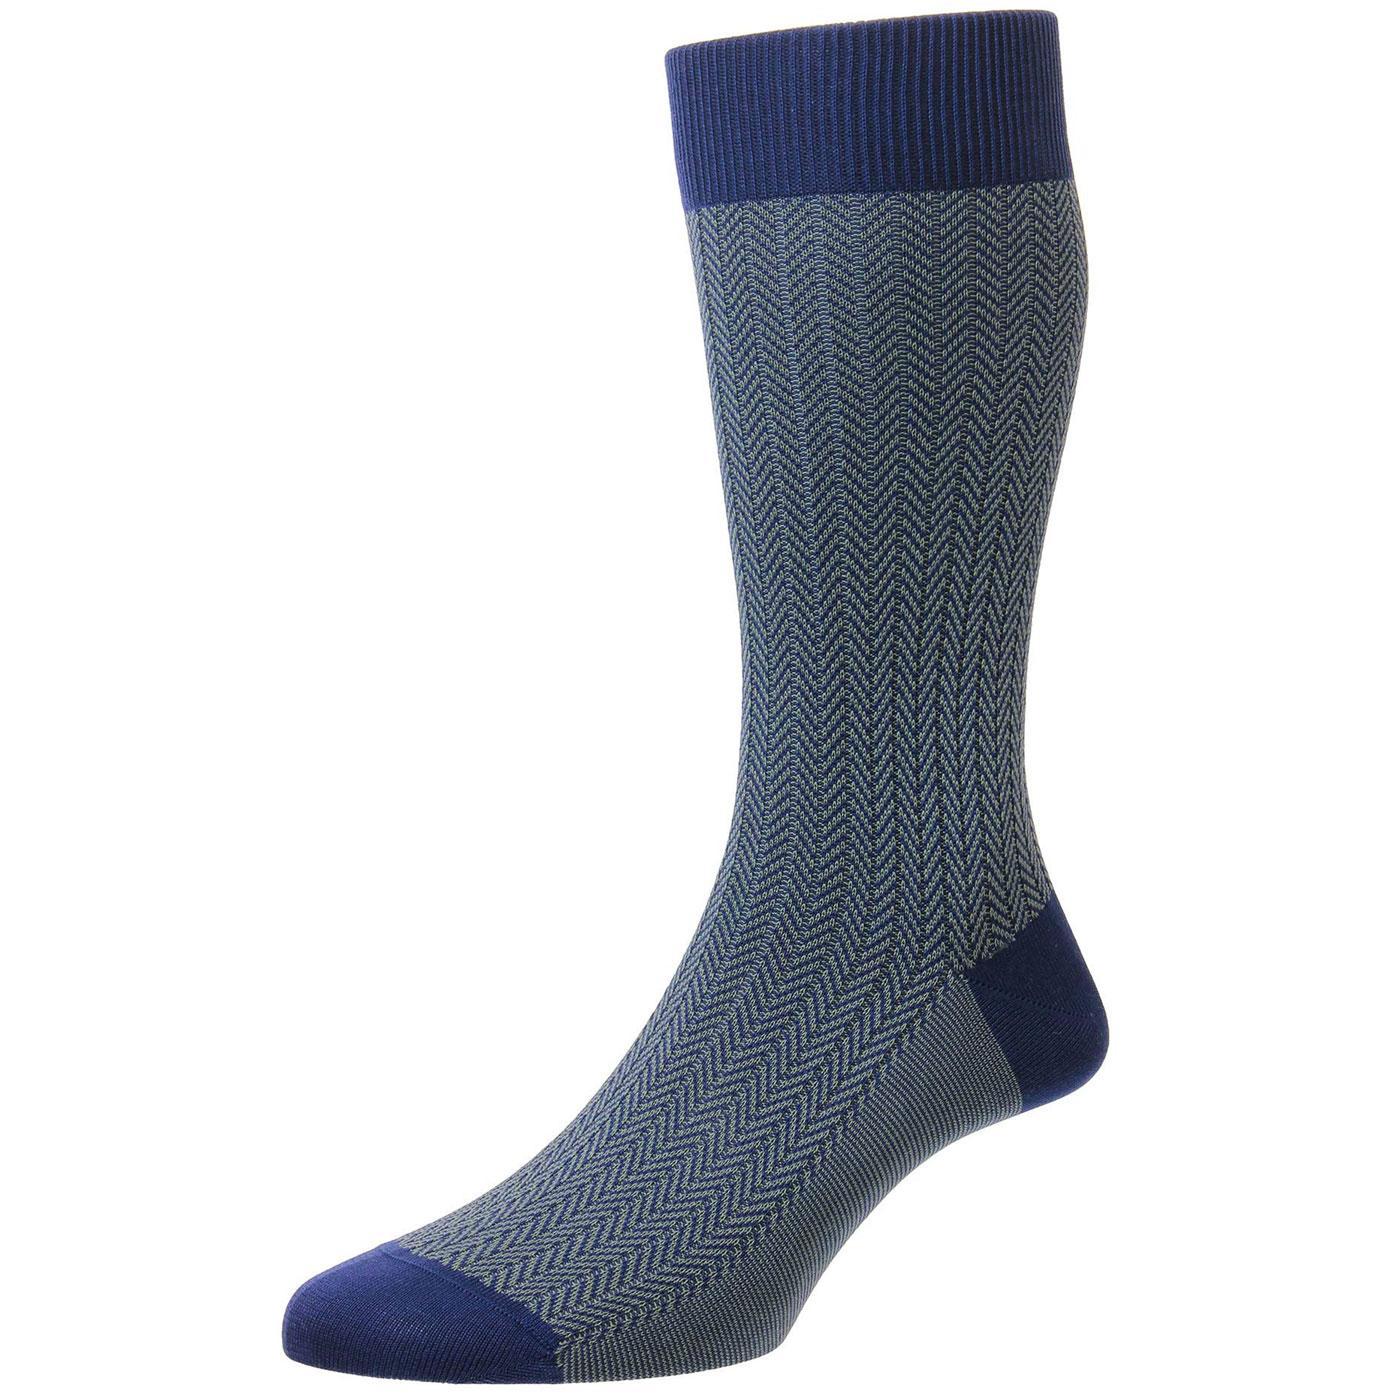 + Fabian PANTHERELLA Men's Mod Herringbone Socks